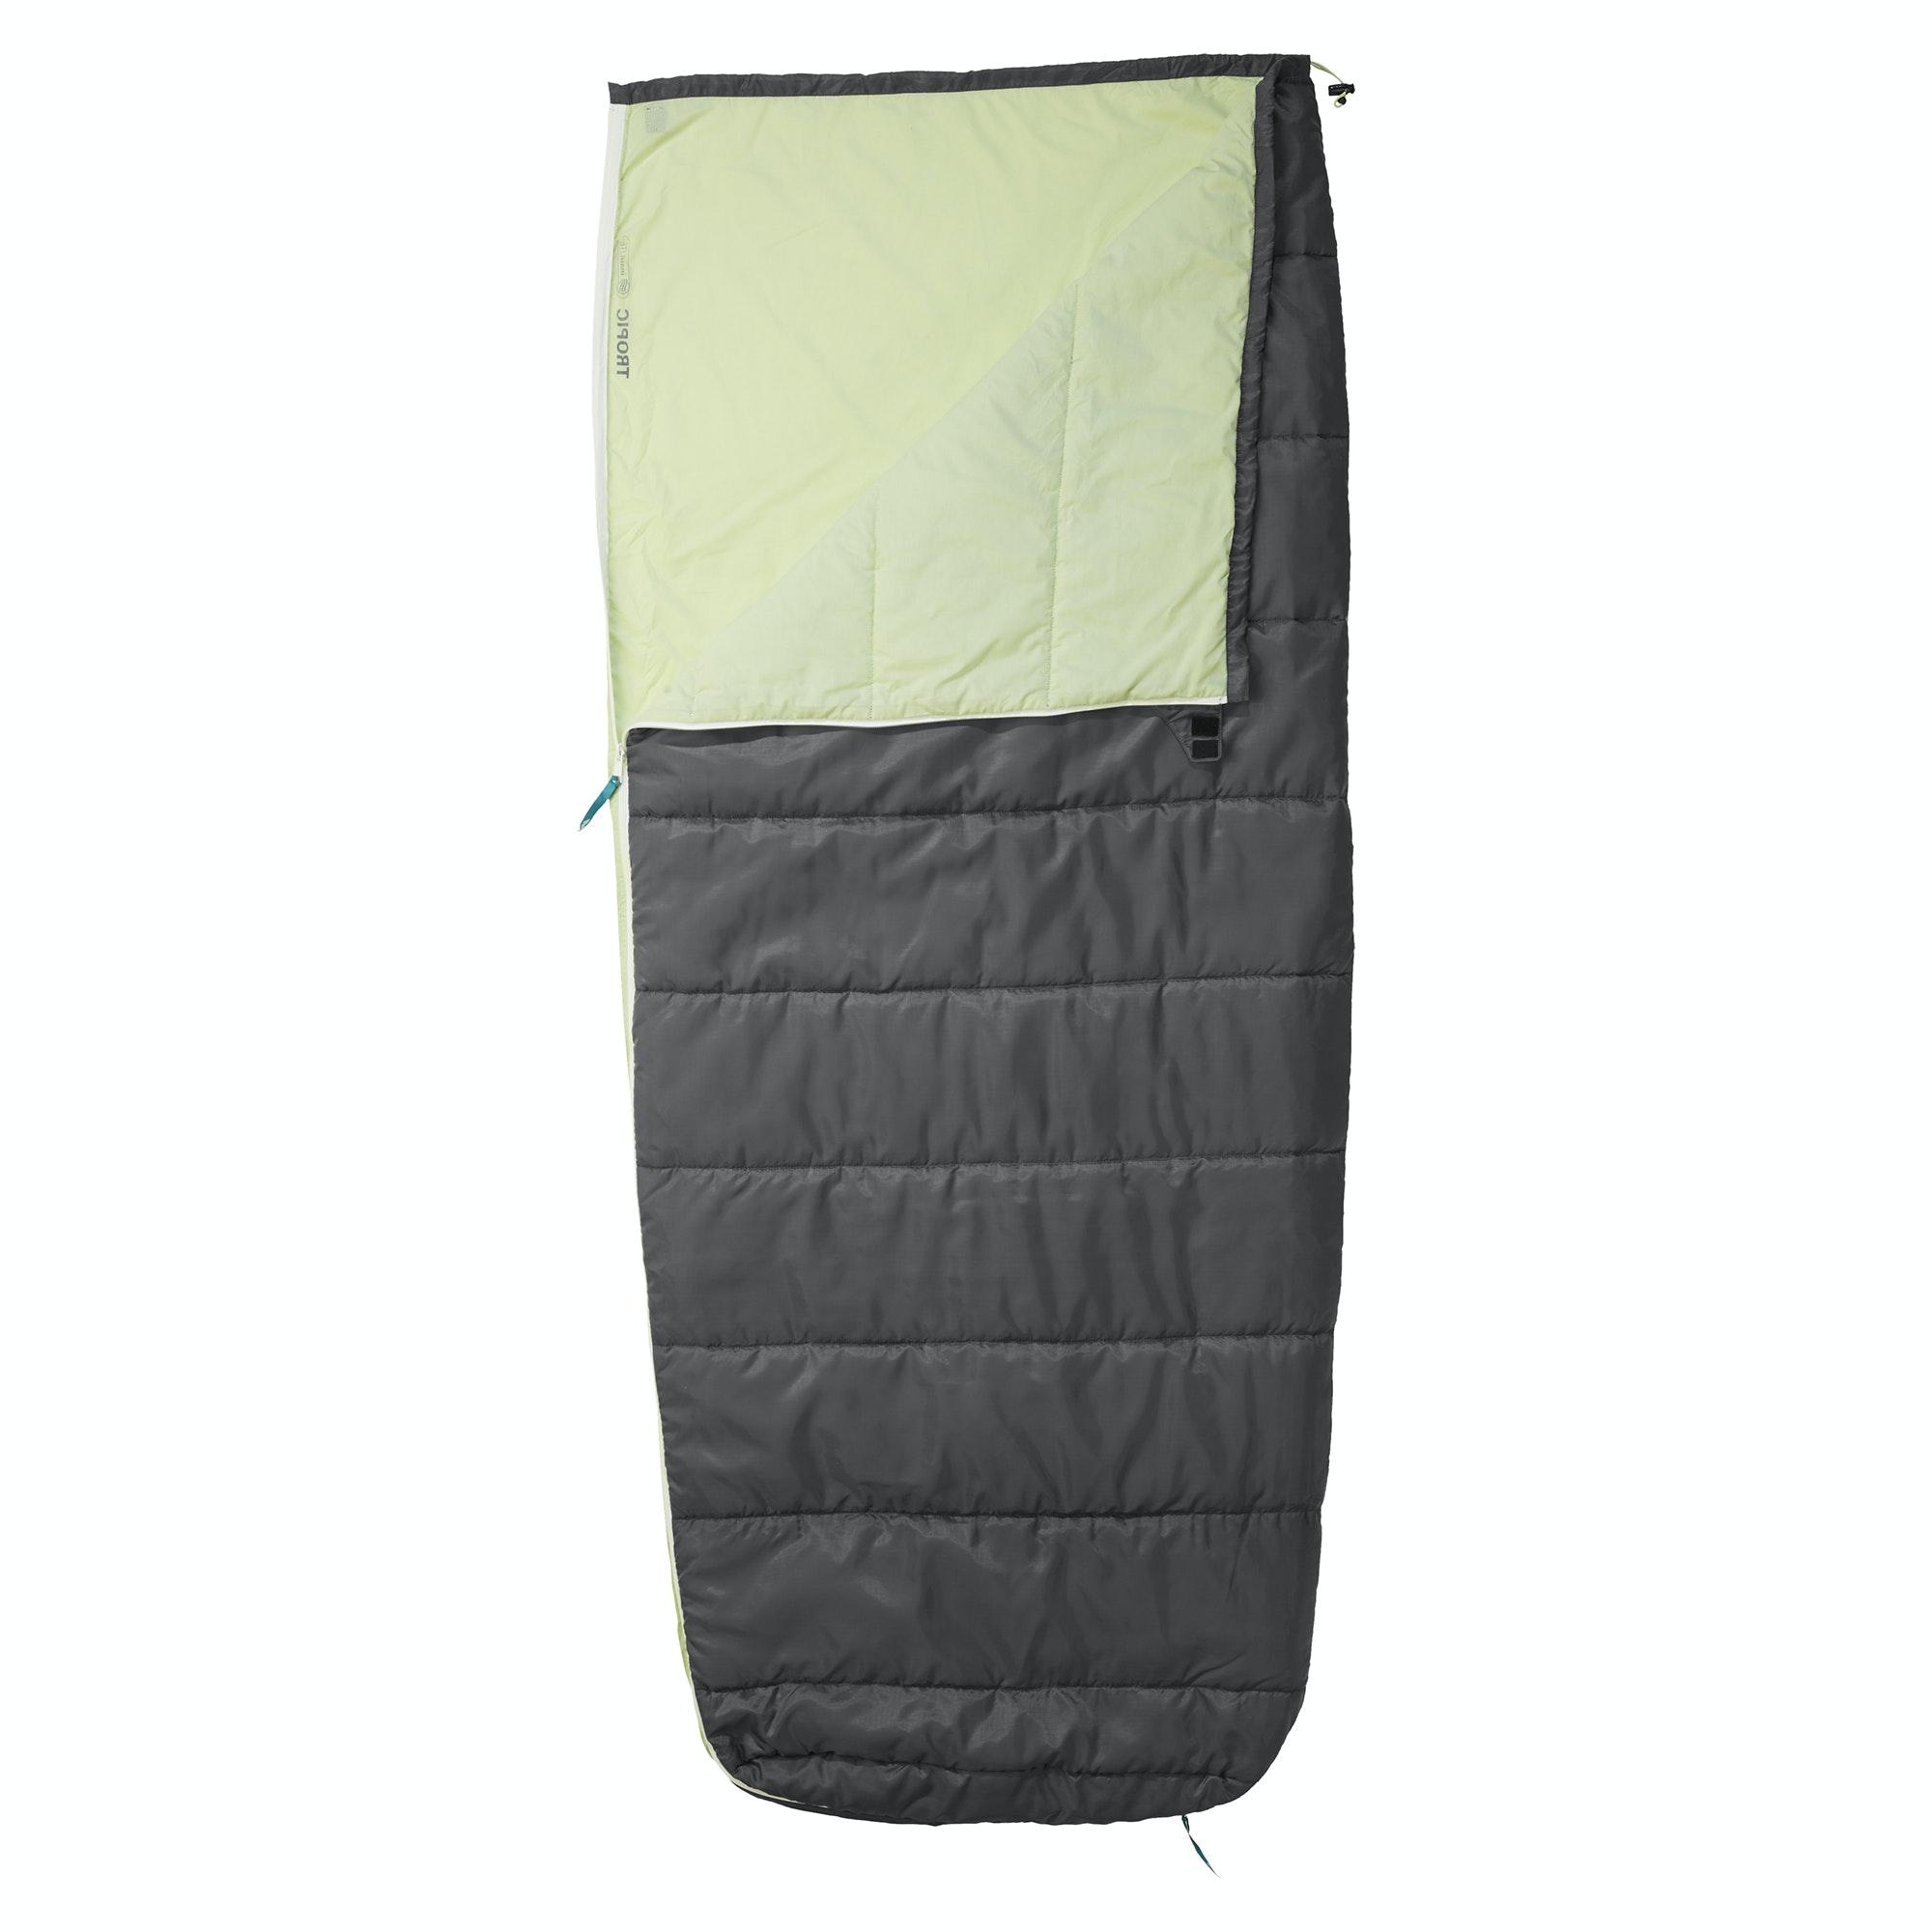 Tropic Lightweight insuLITE Sleeping Bag